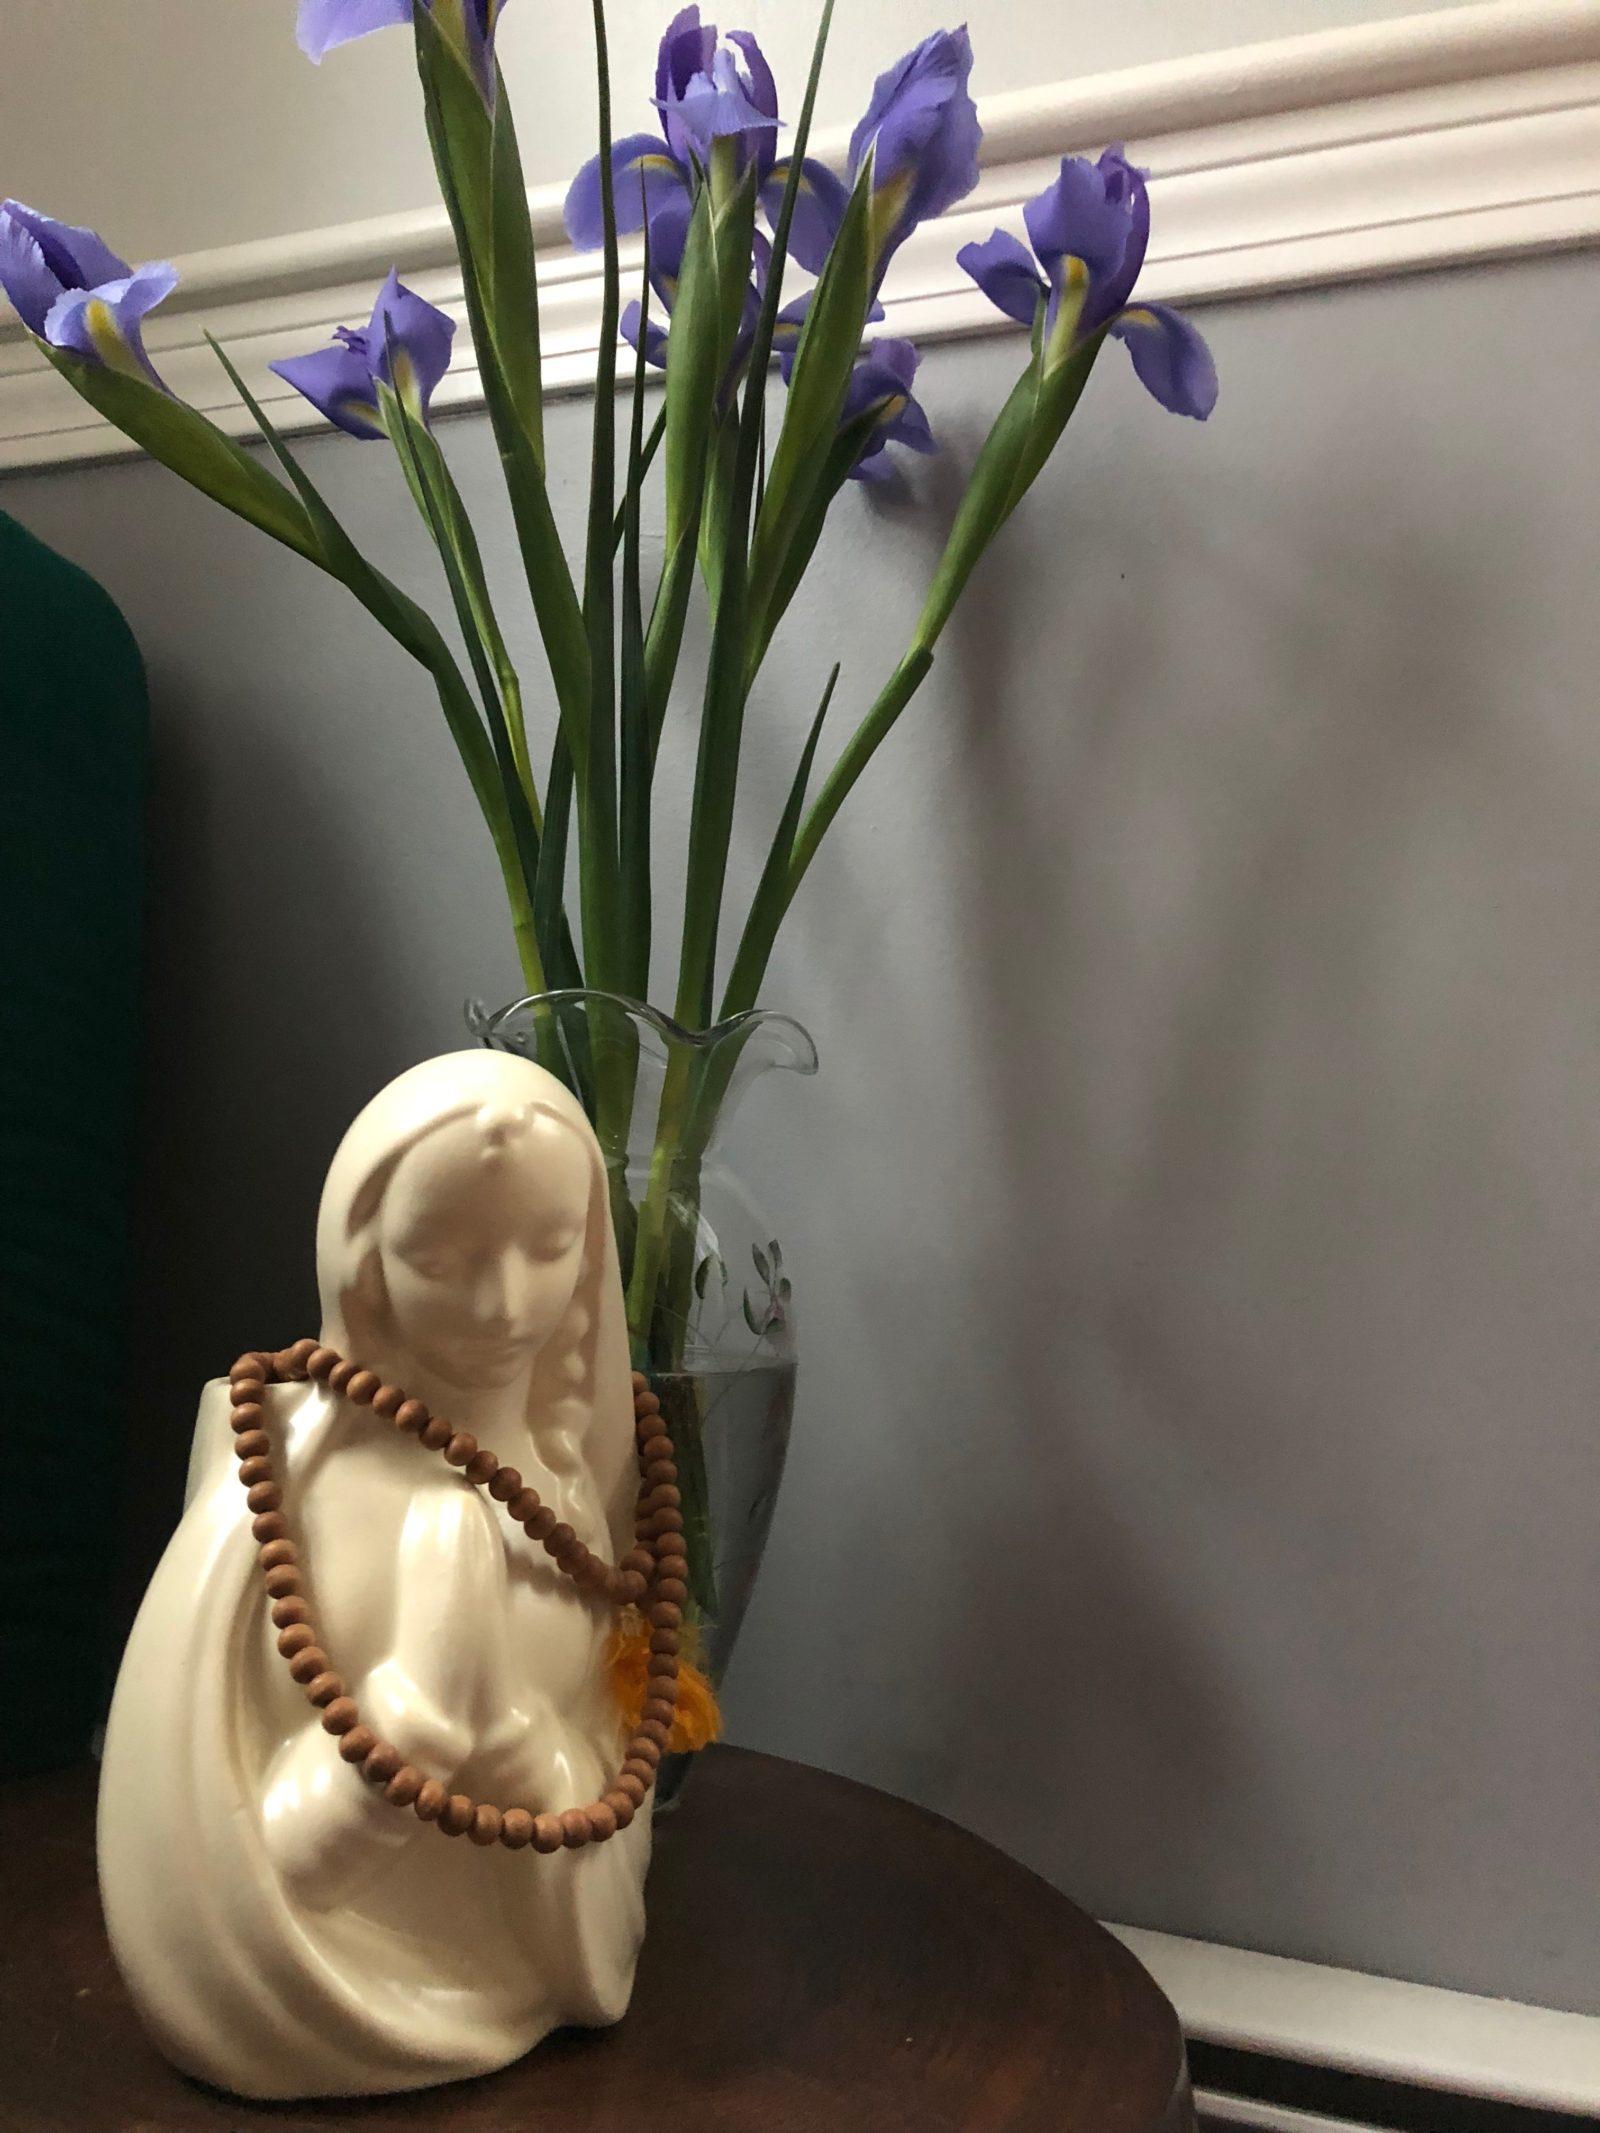 Mother Mary, iris flowers, prayer hands, prayer beads